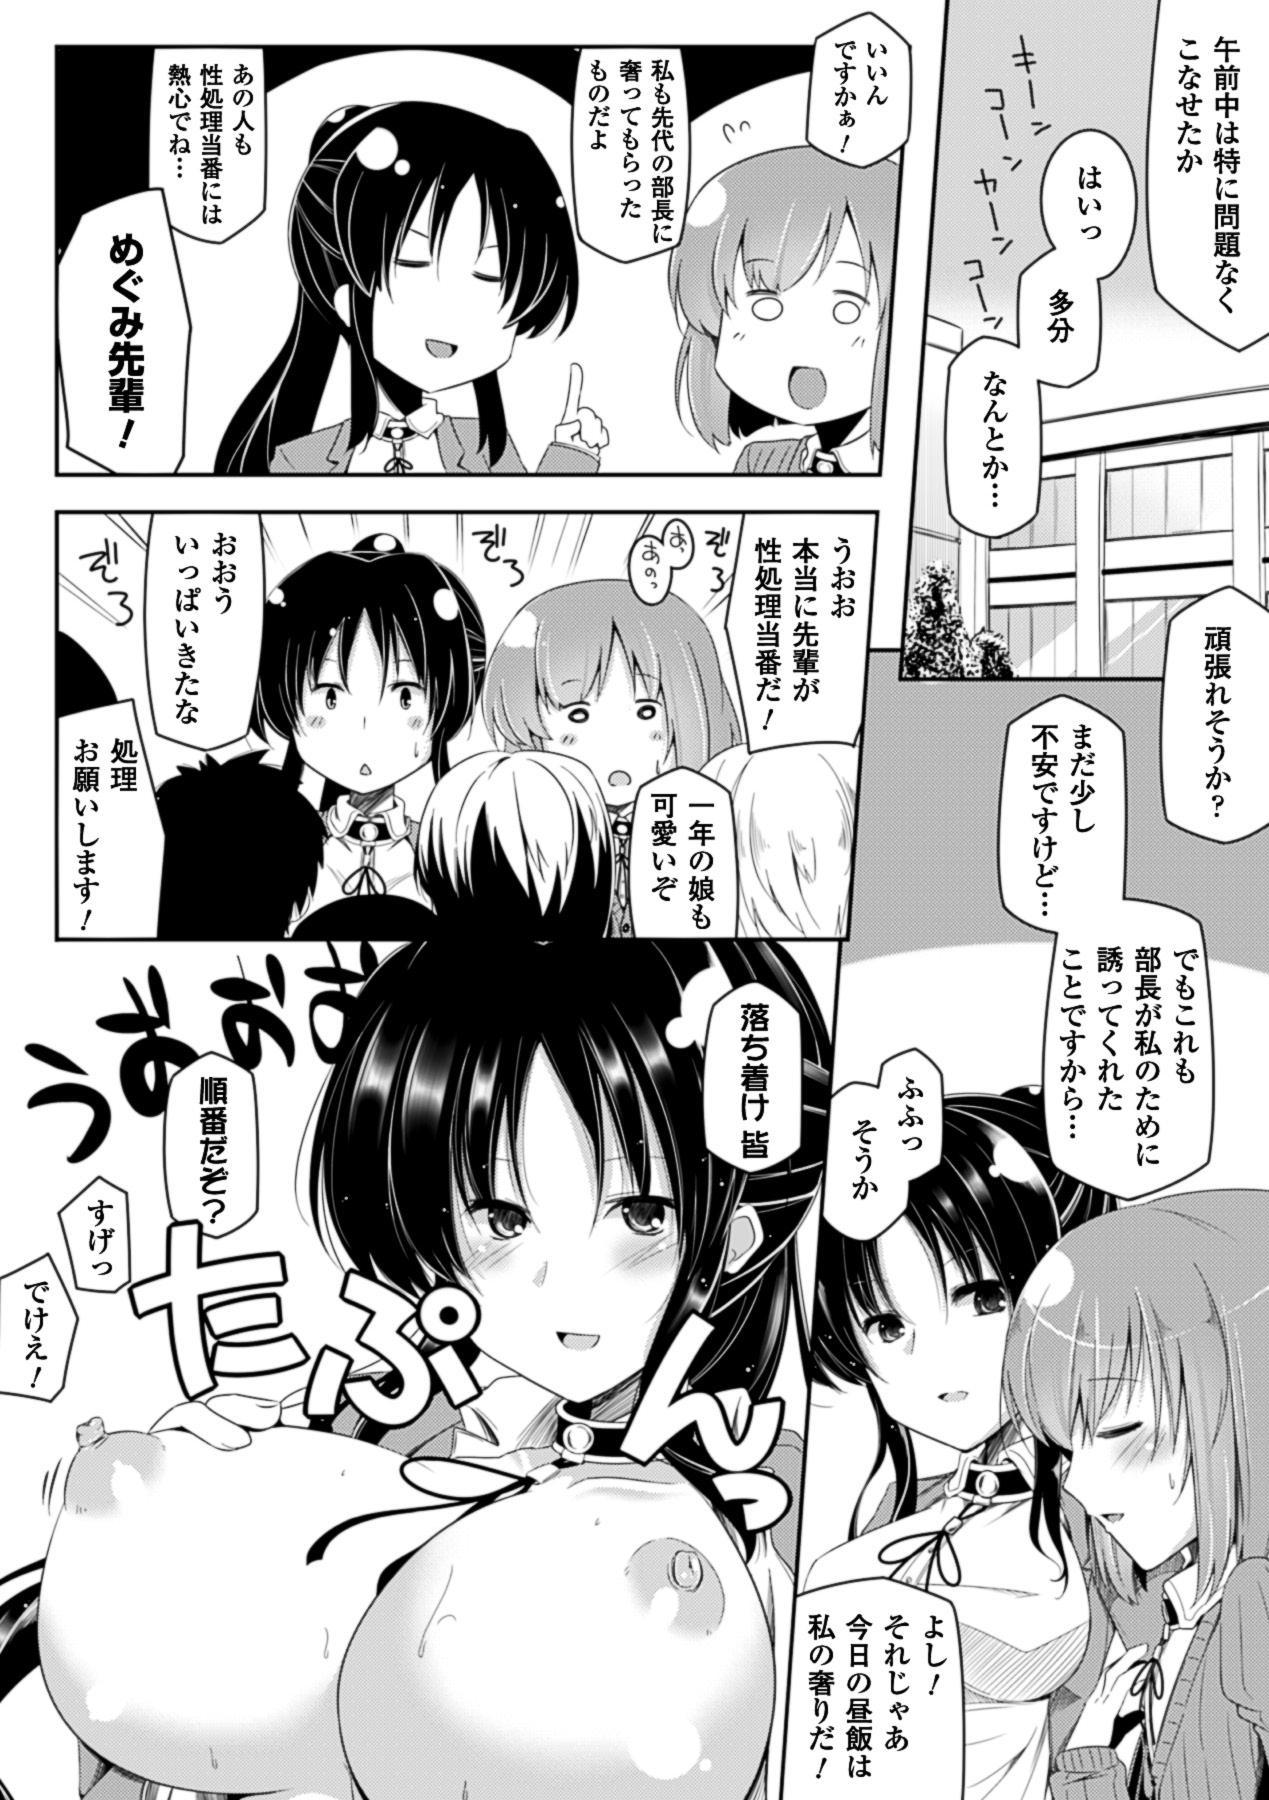 Bessatsu Comic Unreal - Joushiki ga Eroi Ijou na Sekai Vol.2 7